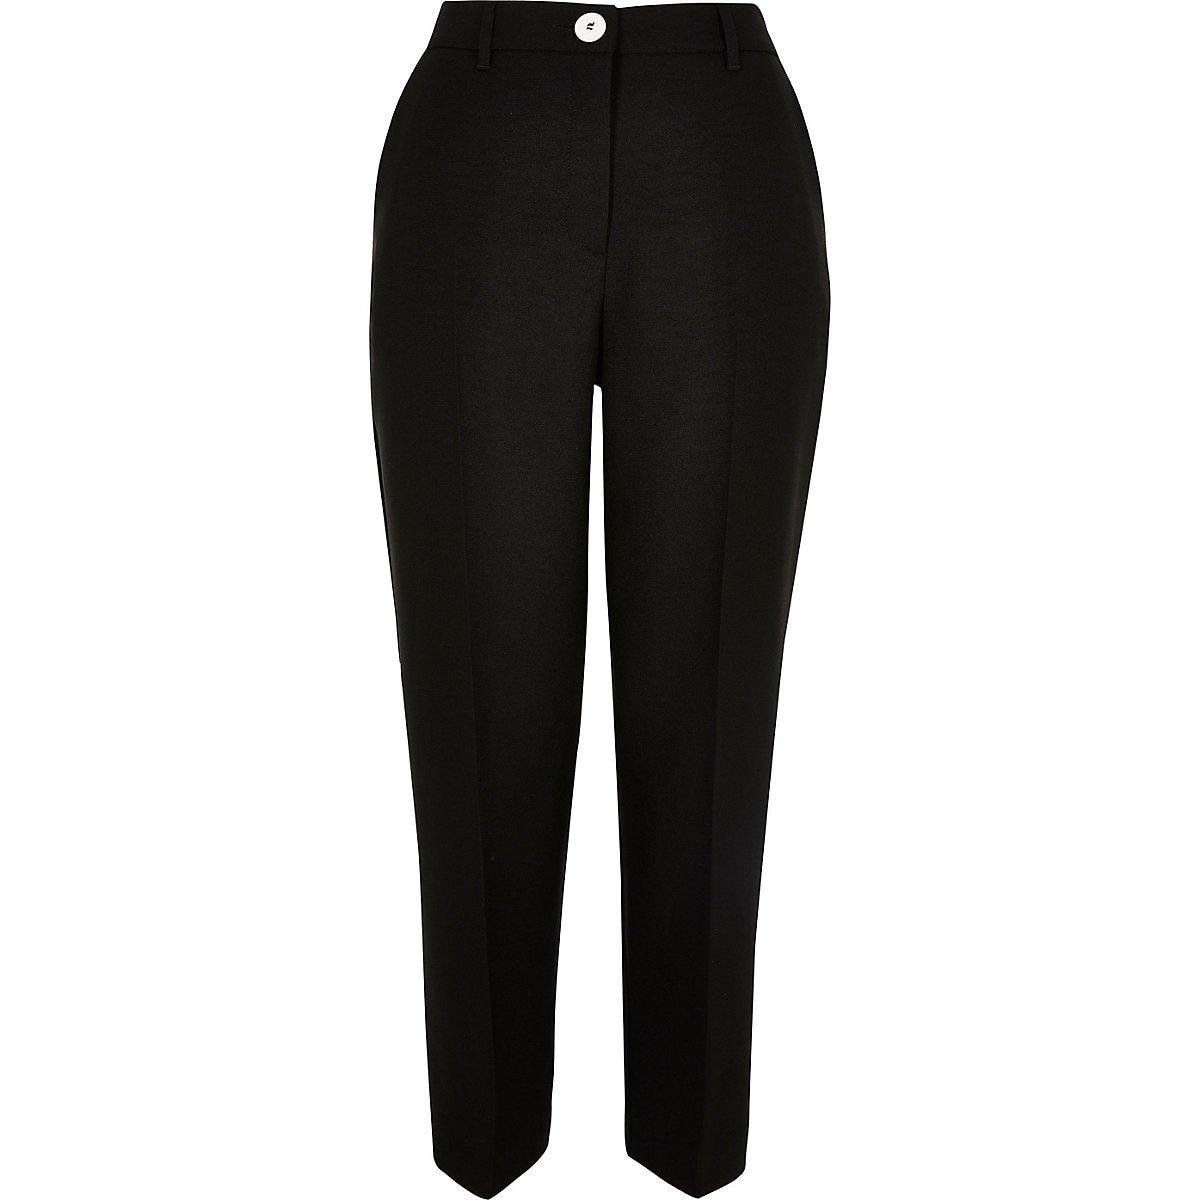 Black cigarette pants - Cigarette Pants - Pants - women